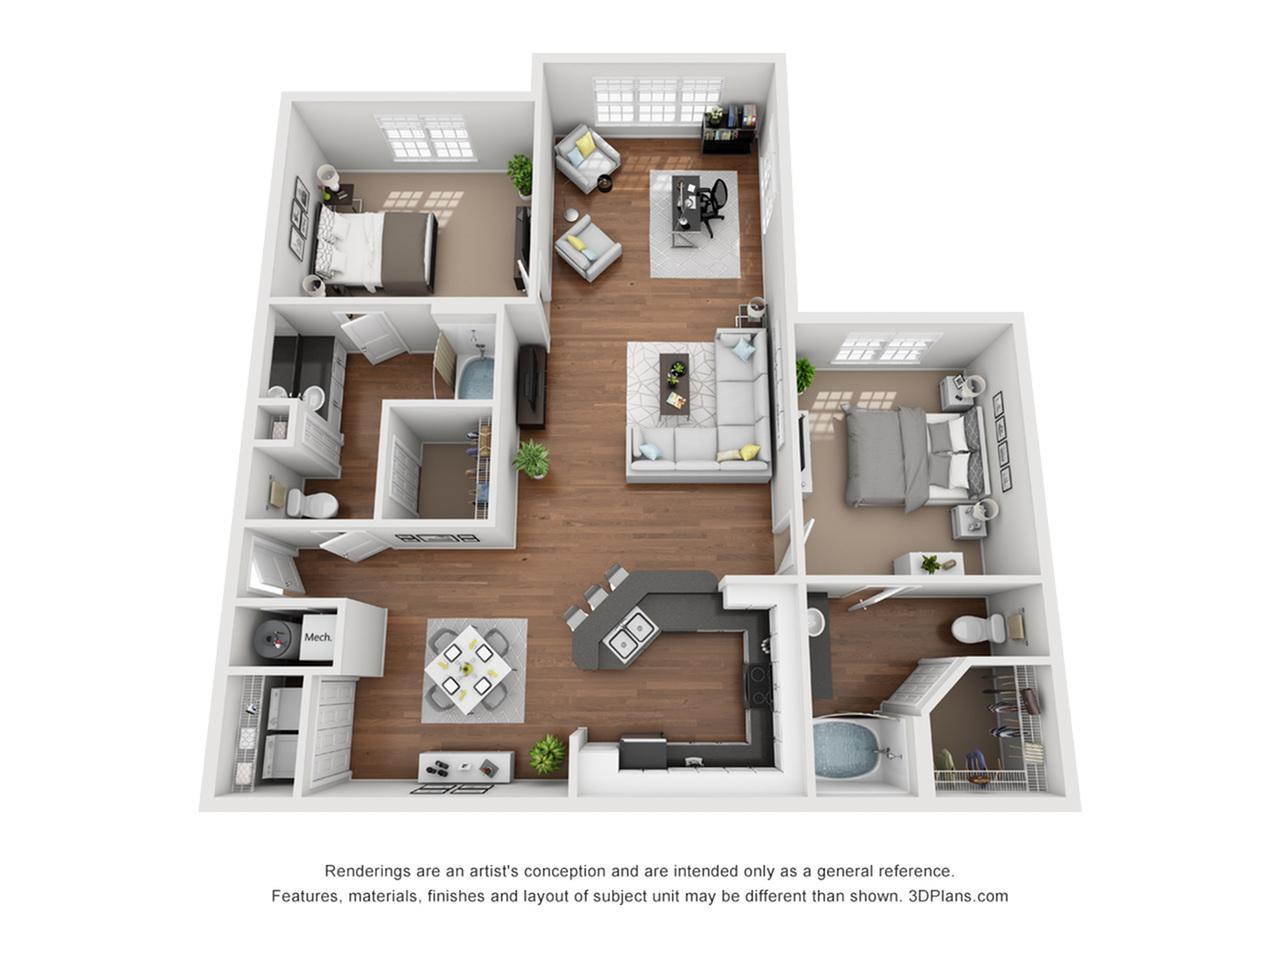 Metal with Solarium, 2 bedroom, two bathroom apartment